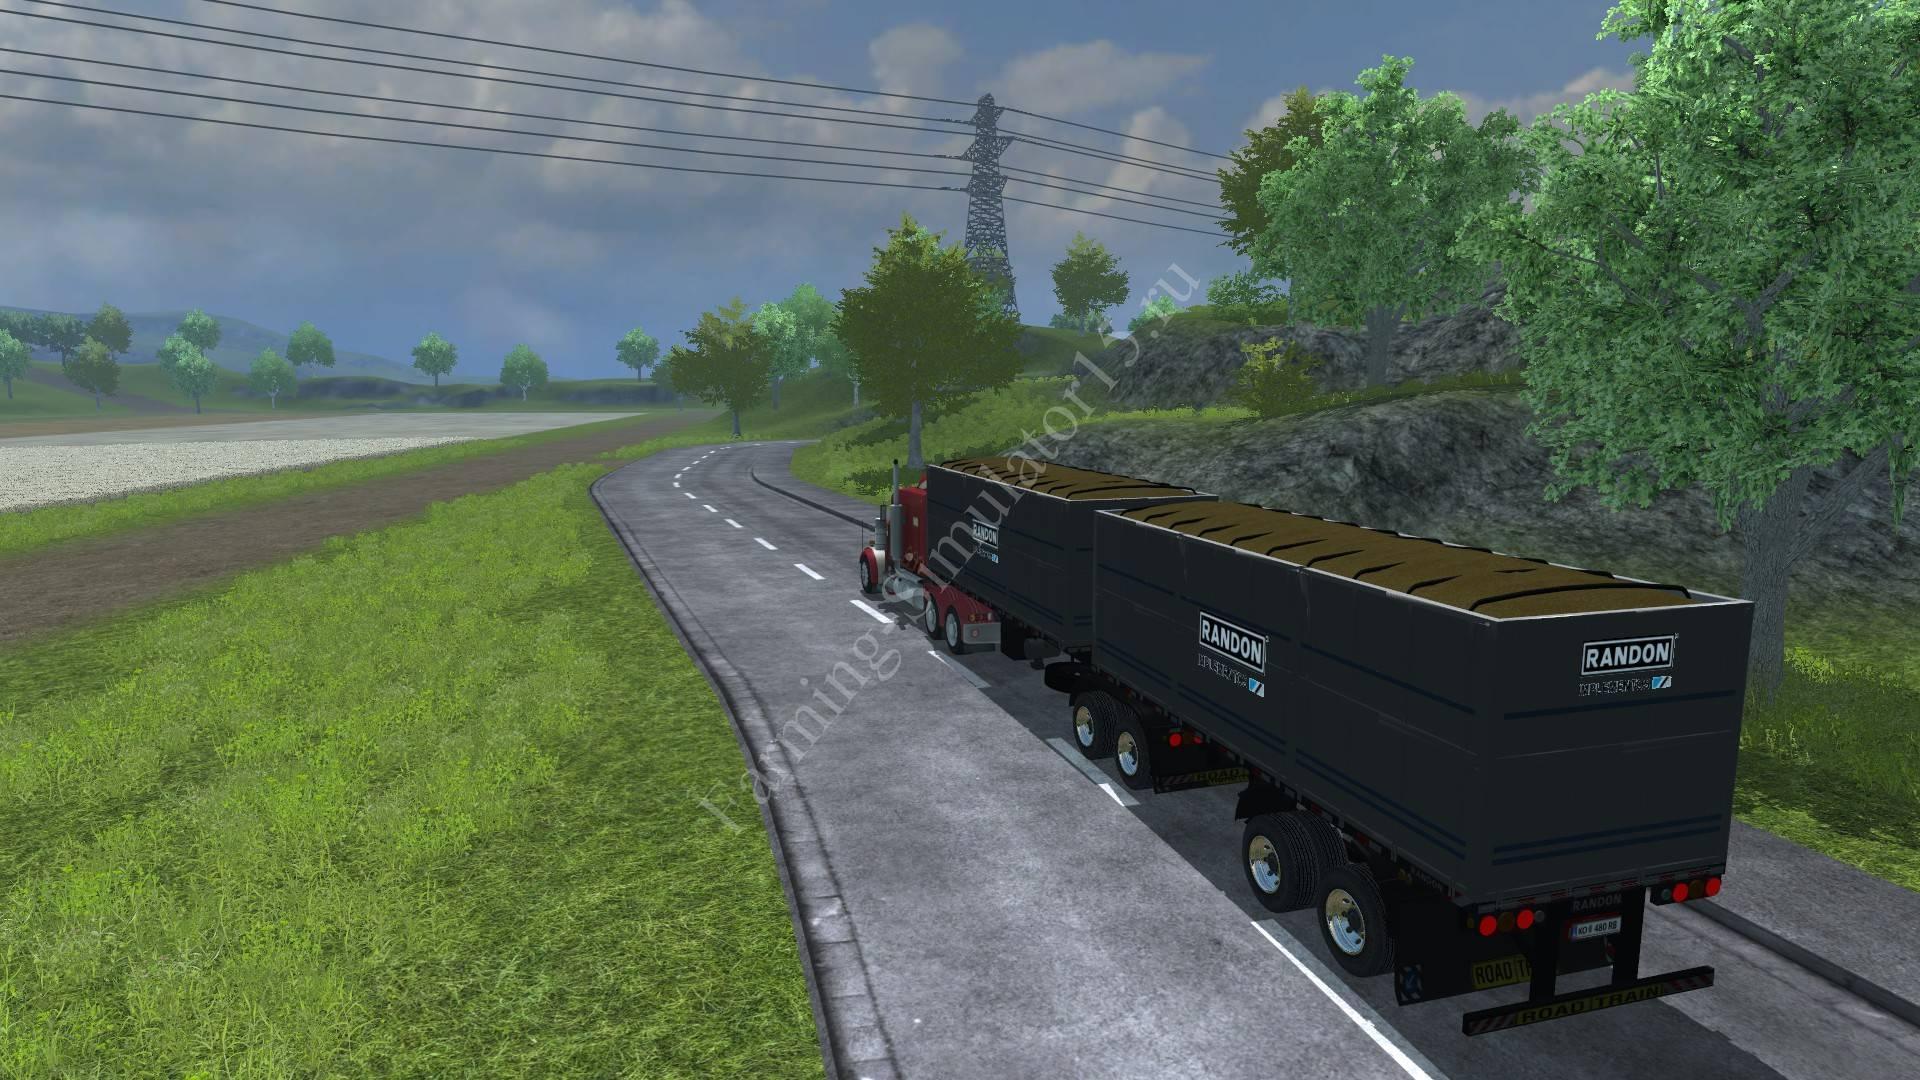 Мод полуприцепа Randon BiTrem Getreideauflieger v 1.0 Farming Simulator 2013, Farming Simulator 13